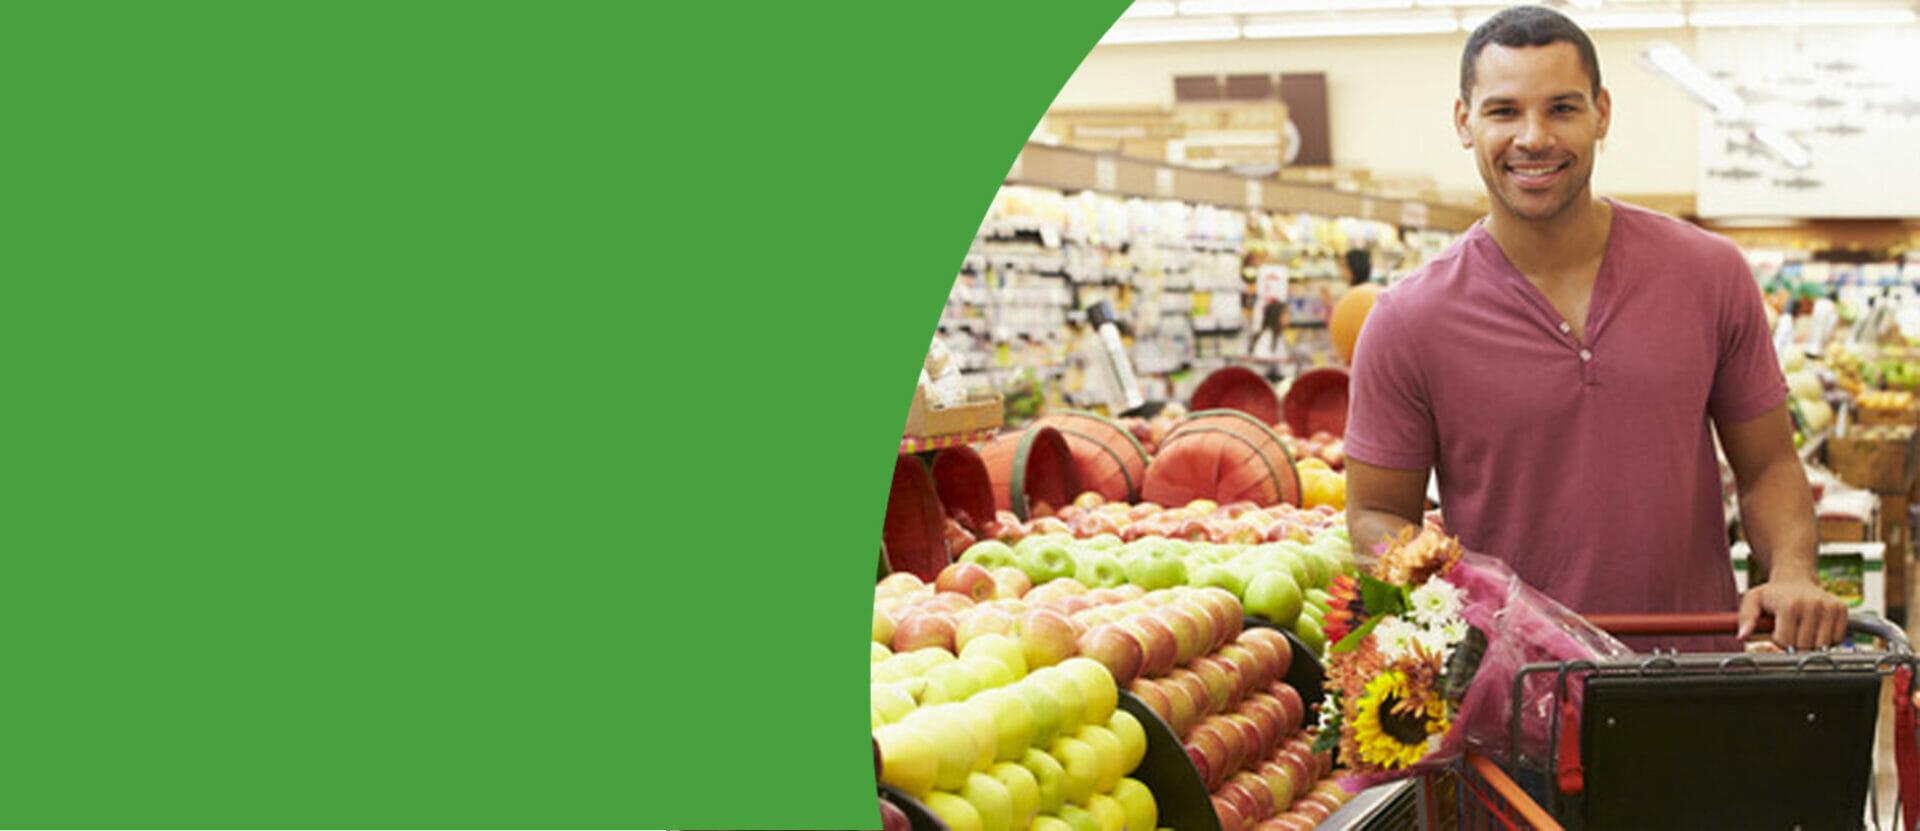 African Grocery online Header Image